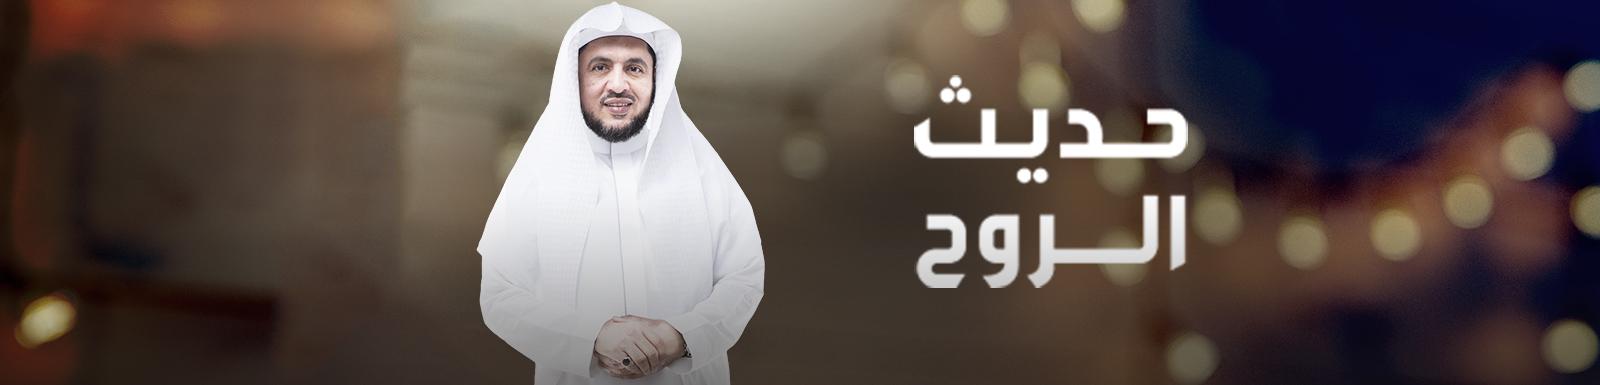 ����� ������ ���� ����� ������ 13 ���� �� 2016